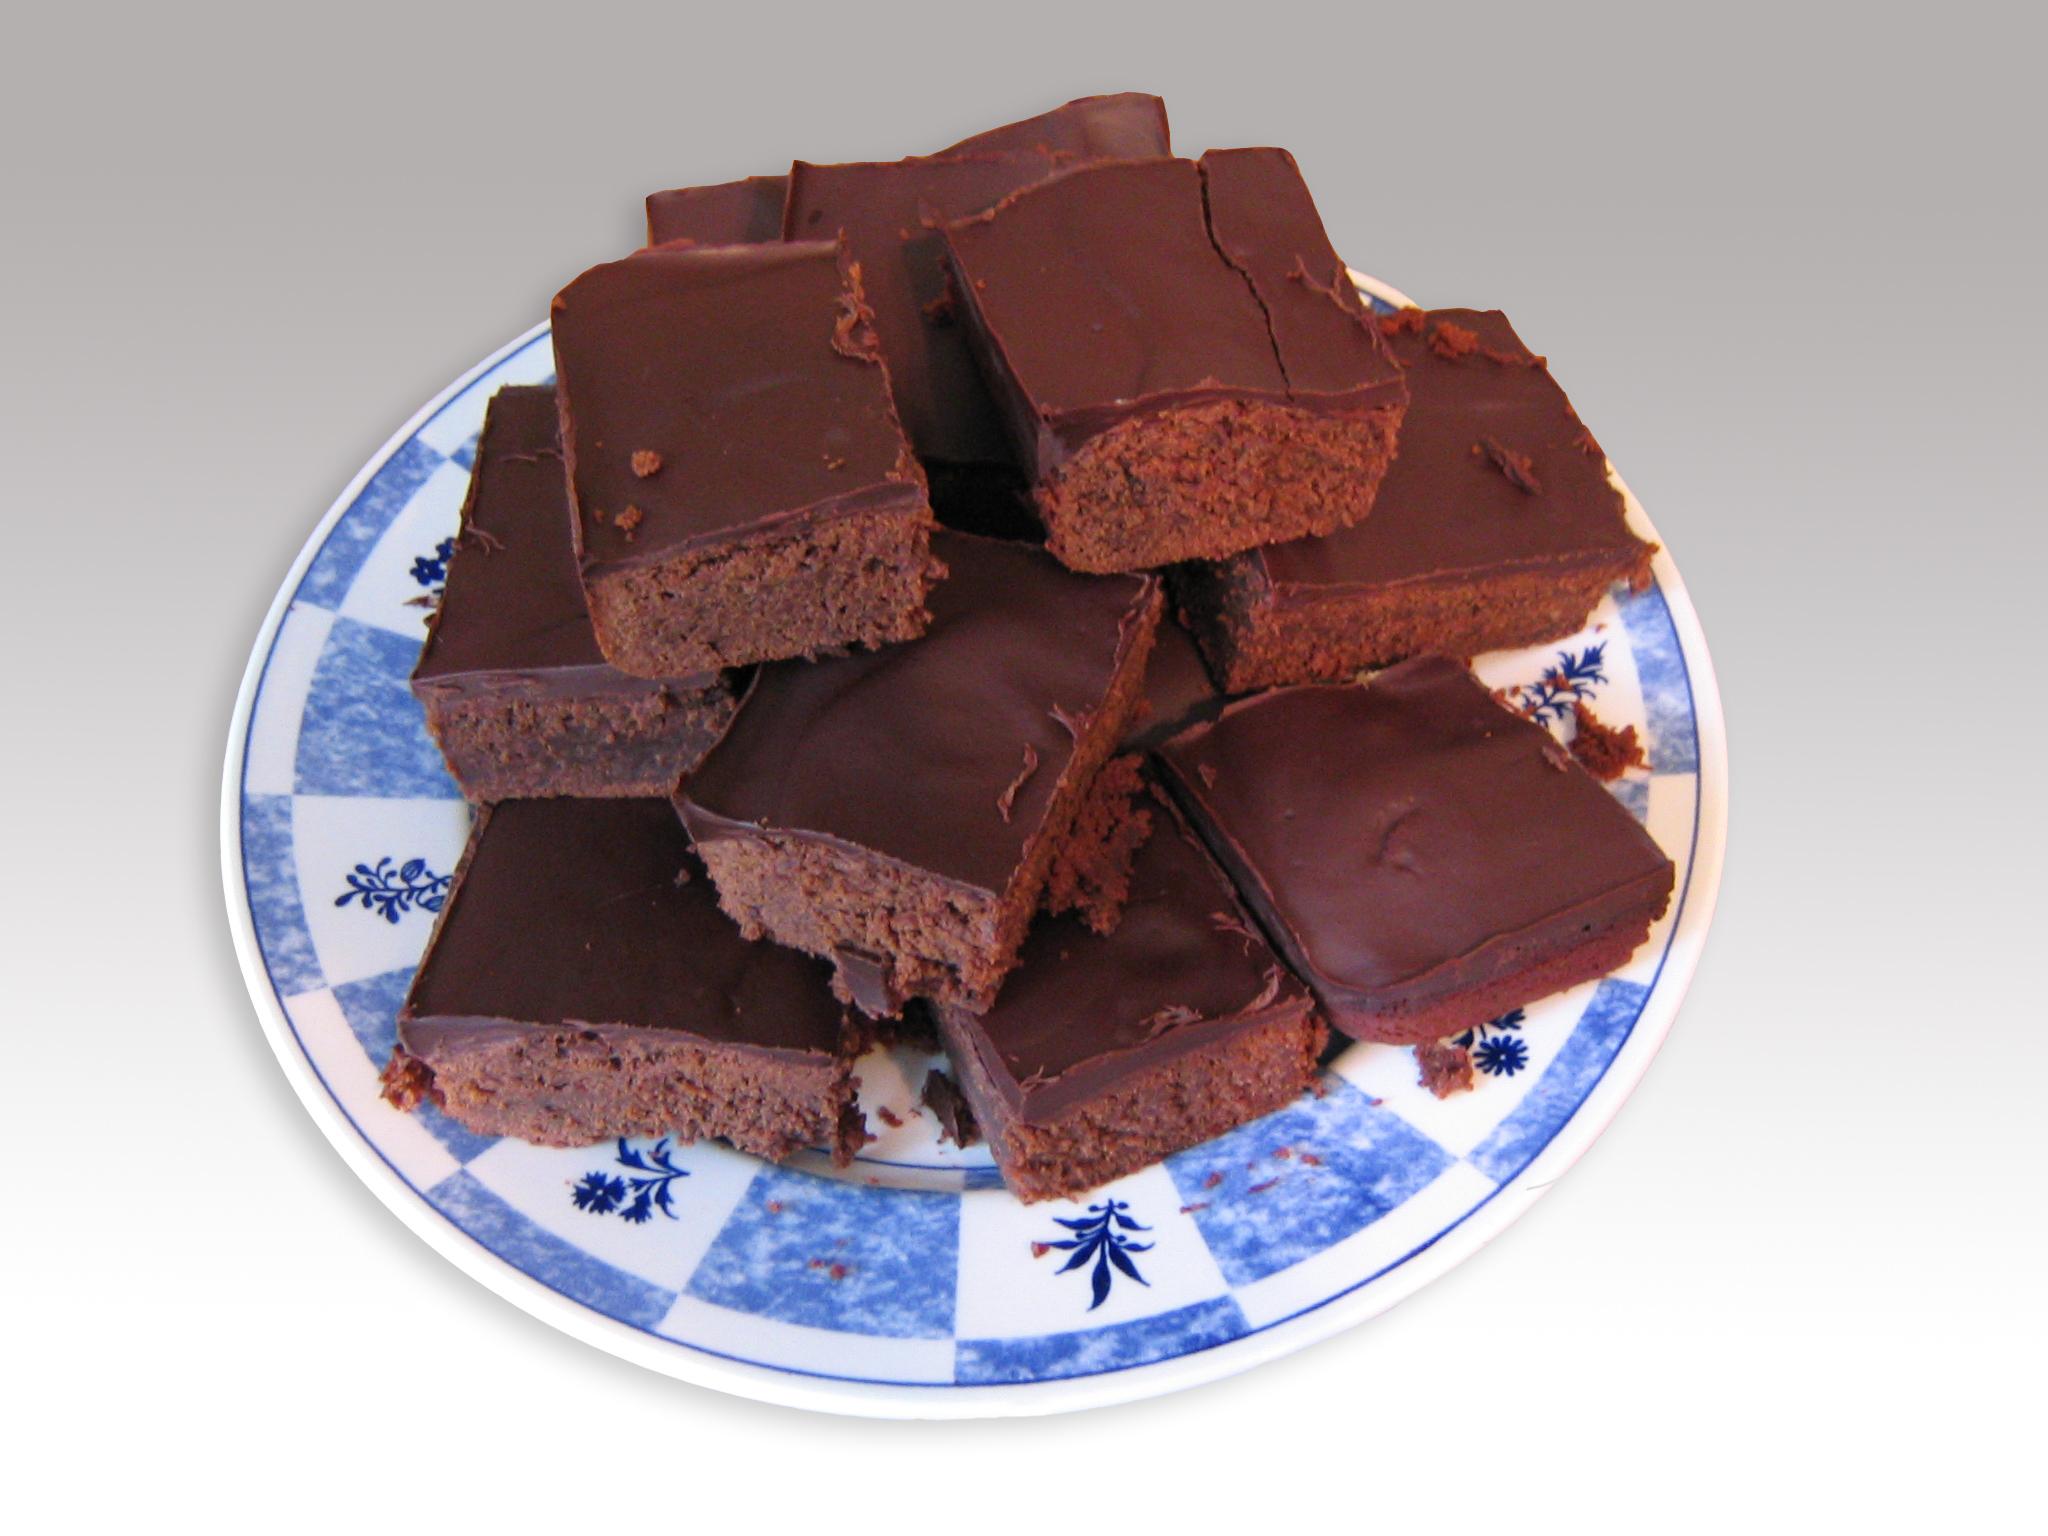 2223242526. десерт. Брауни. шоколадное пирожное. Chocolate brownie.